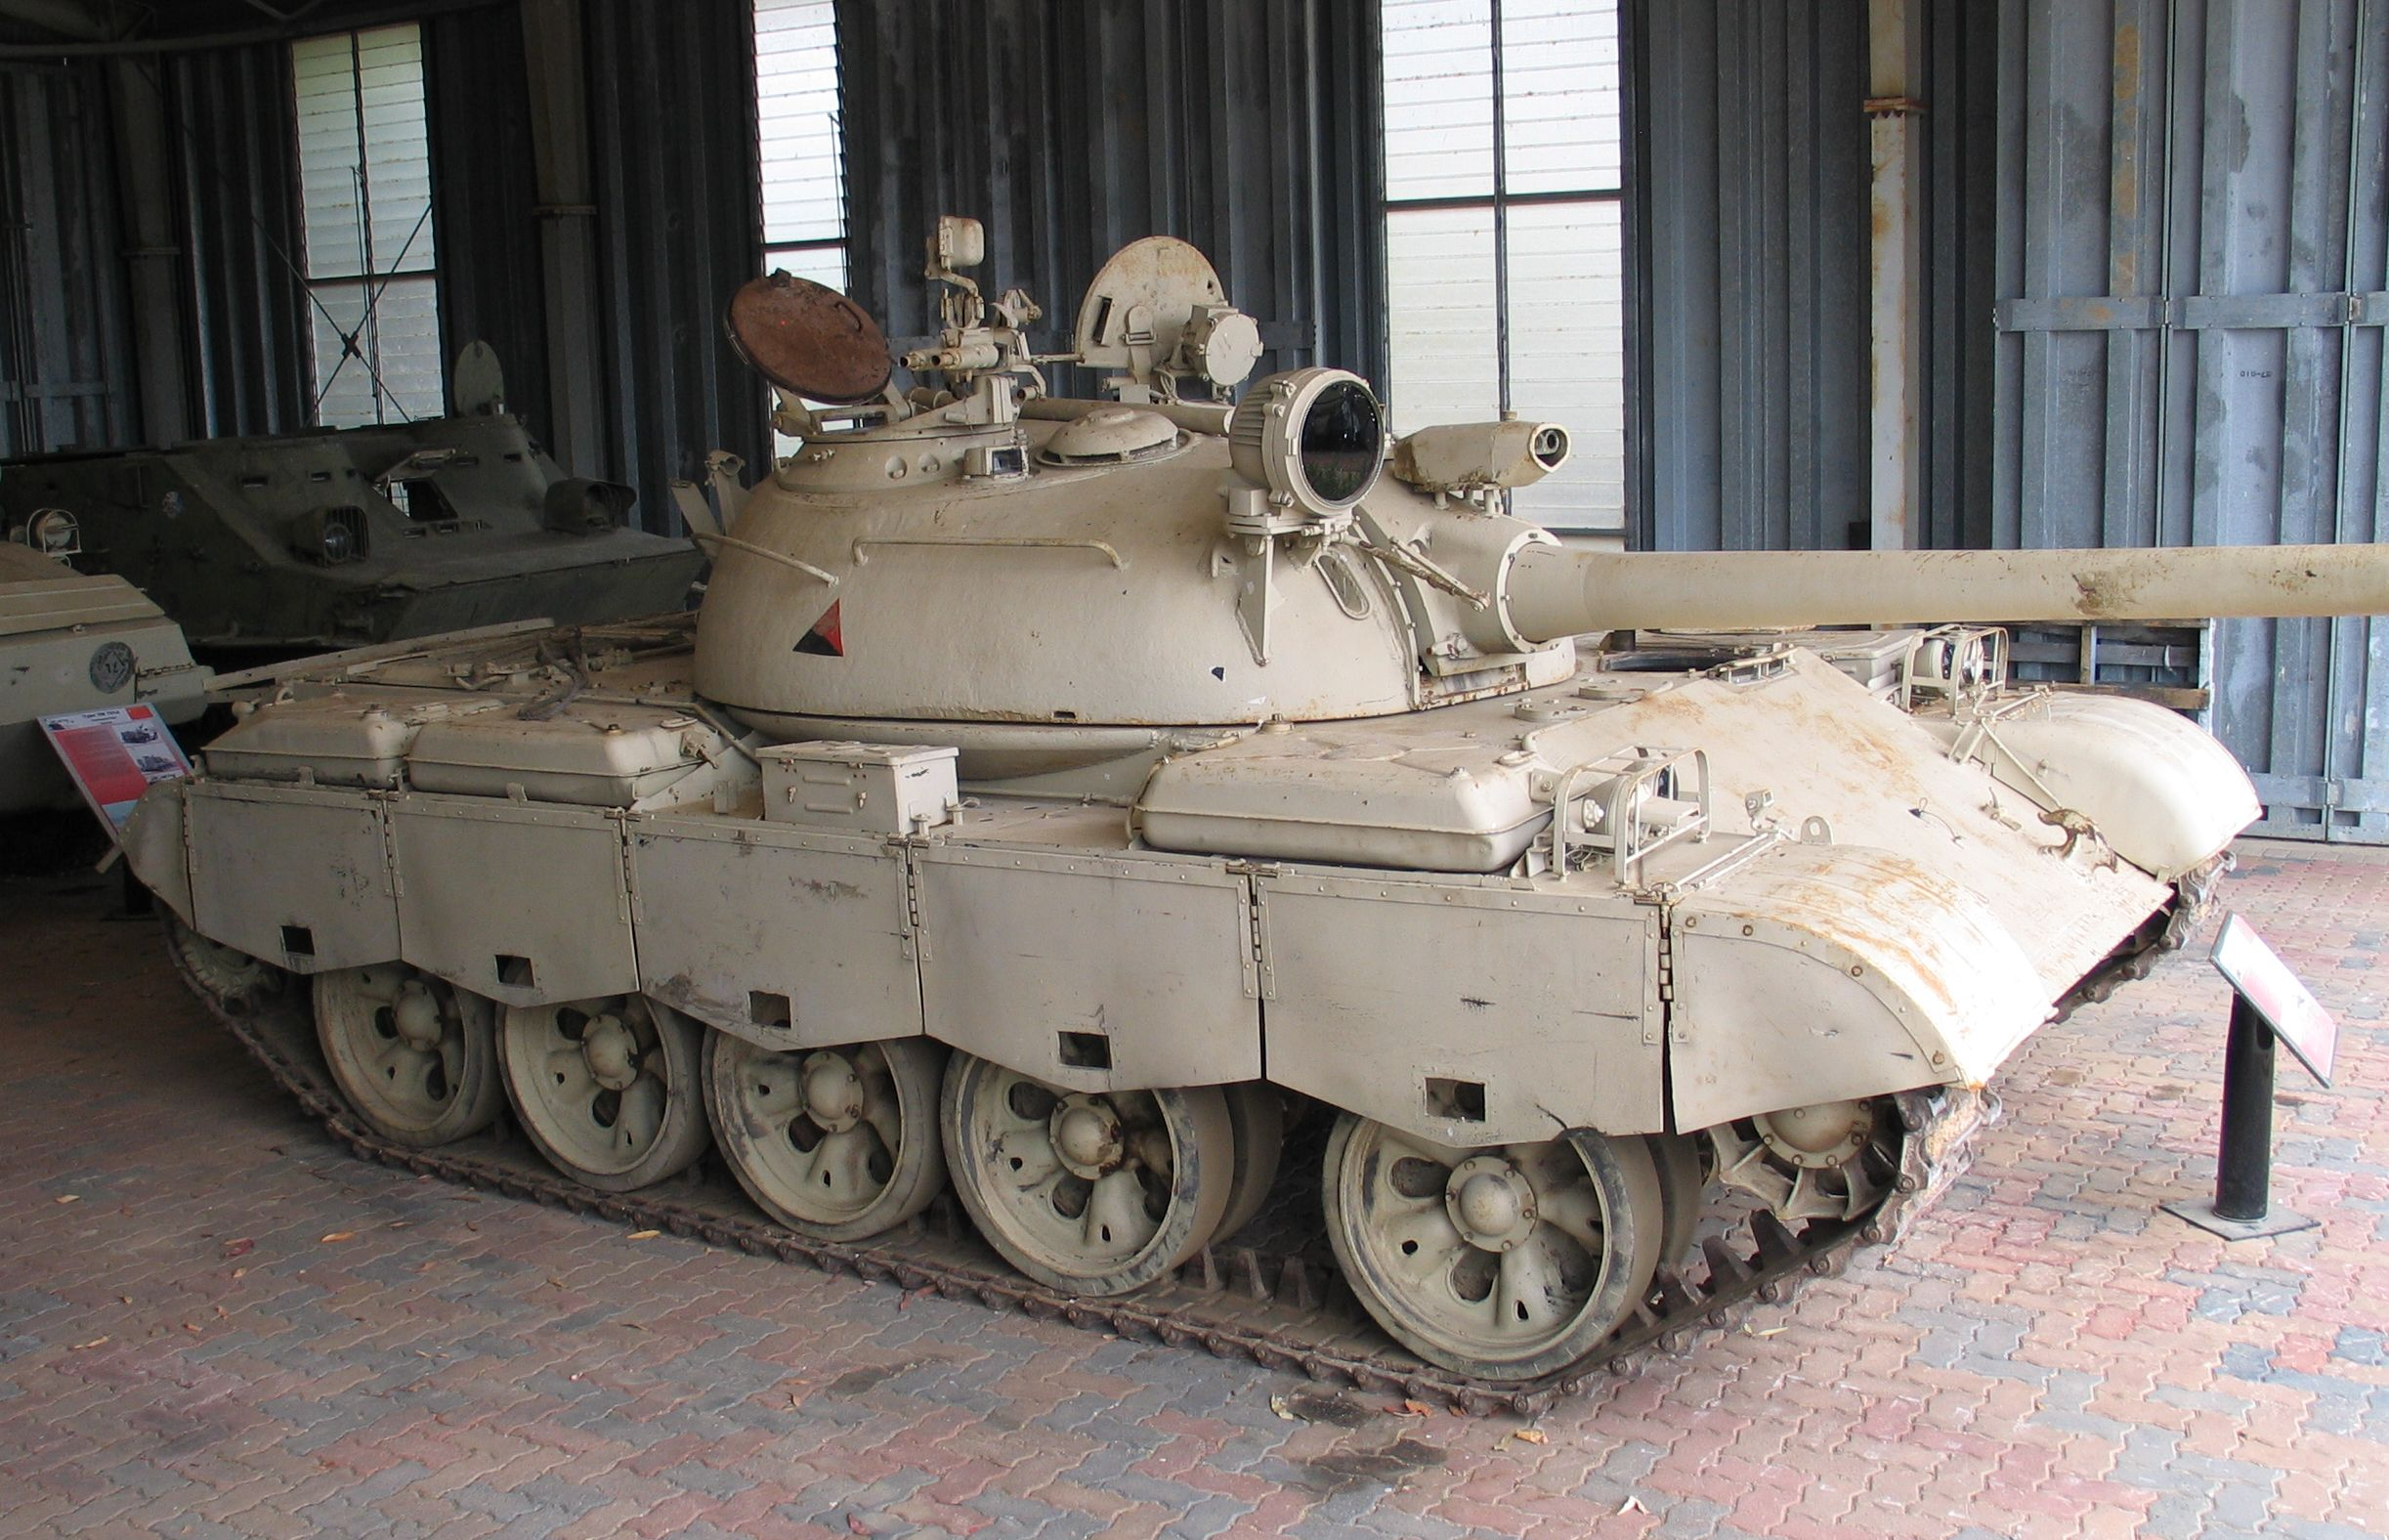 Тип 69 ii тип 63 тип 59 т 54 55 m48a5 т 80 тип 85 аль